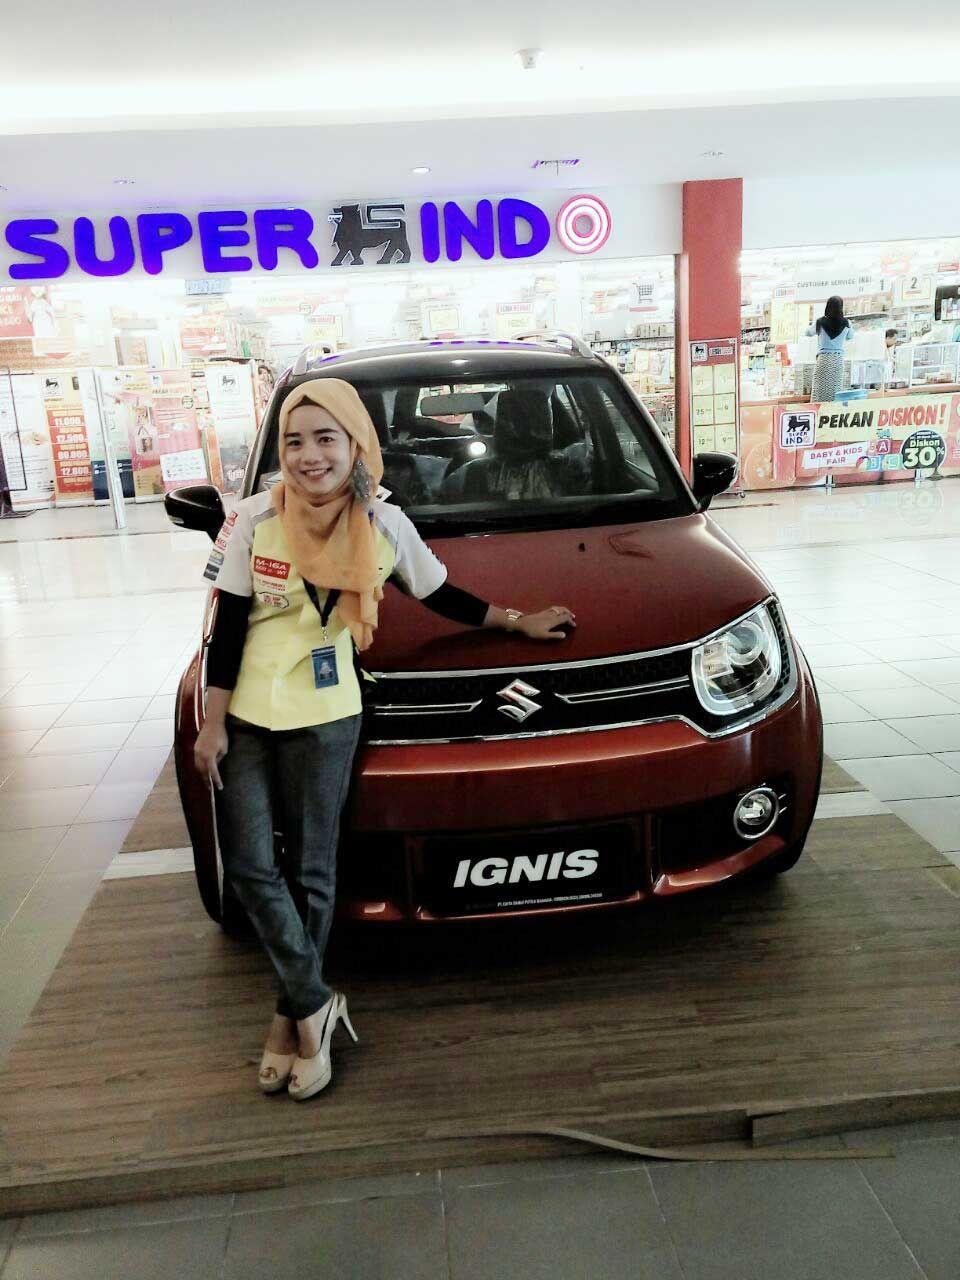 Suzuki Cirebon Sales Marketing Mobil Dealer Suzuki Cirebon Harga Terbaru Suzuki All New Ertiga New Ertiga Dreza Sx4 S Cross Ig Mobil Marketing Mobil Bekas